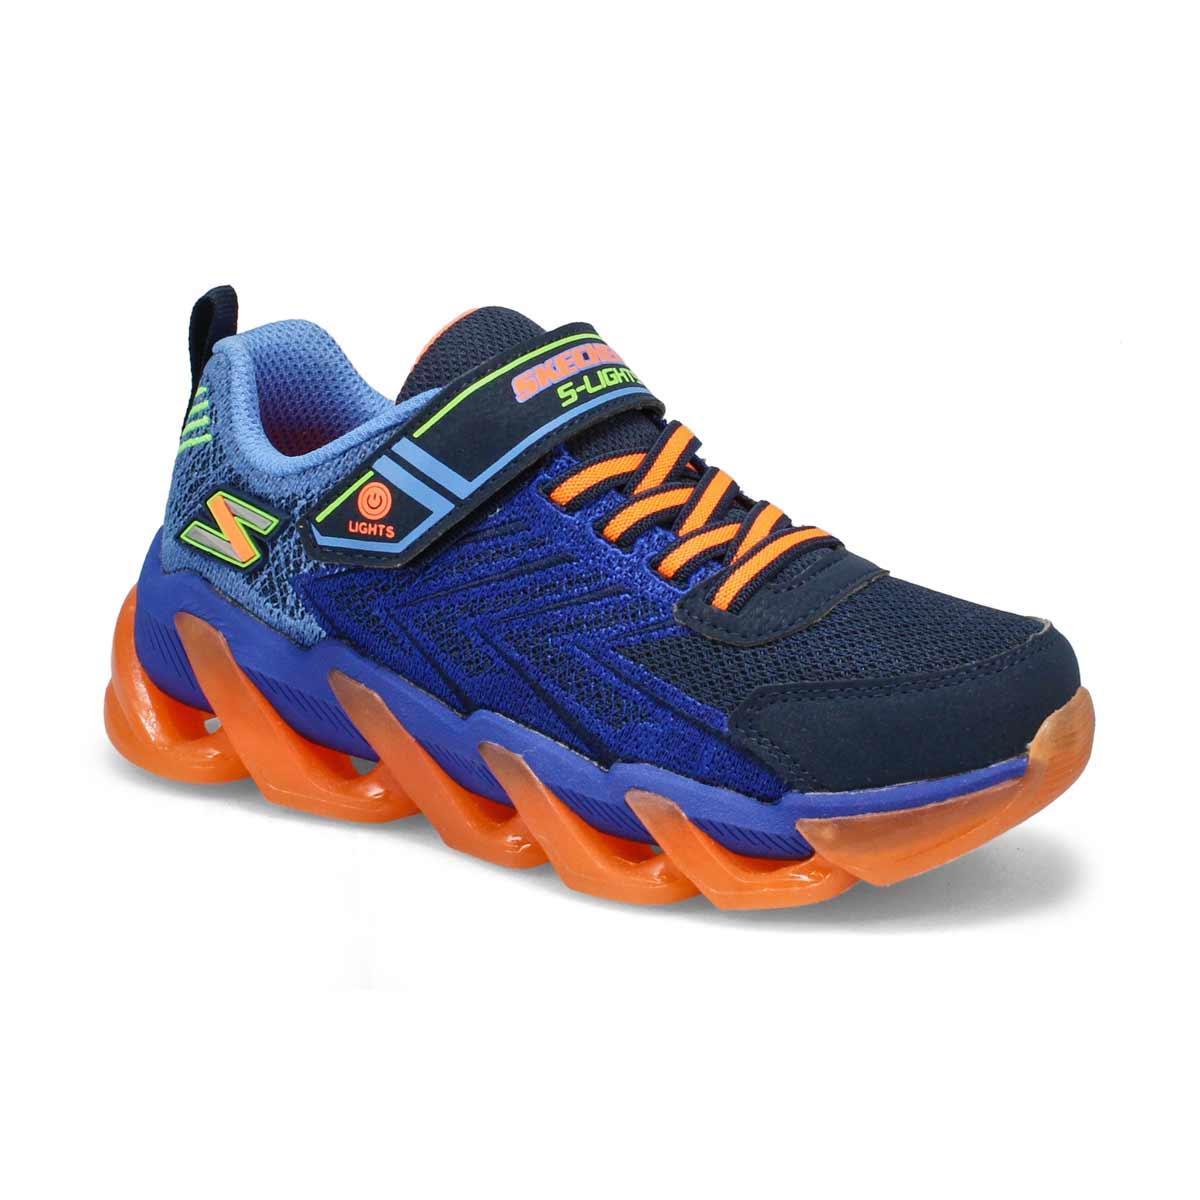 Boys' Mega-Surge Sneakers - Navy/Orange